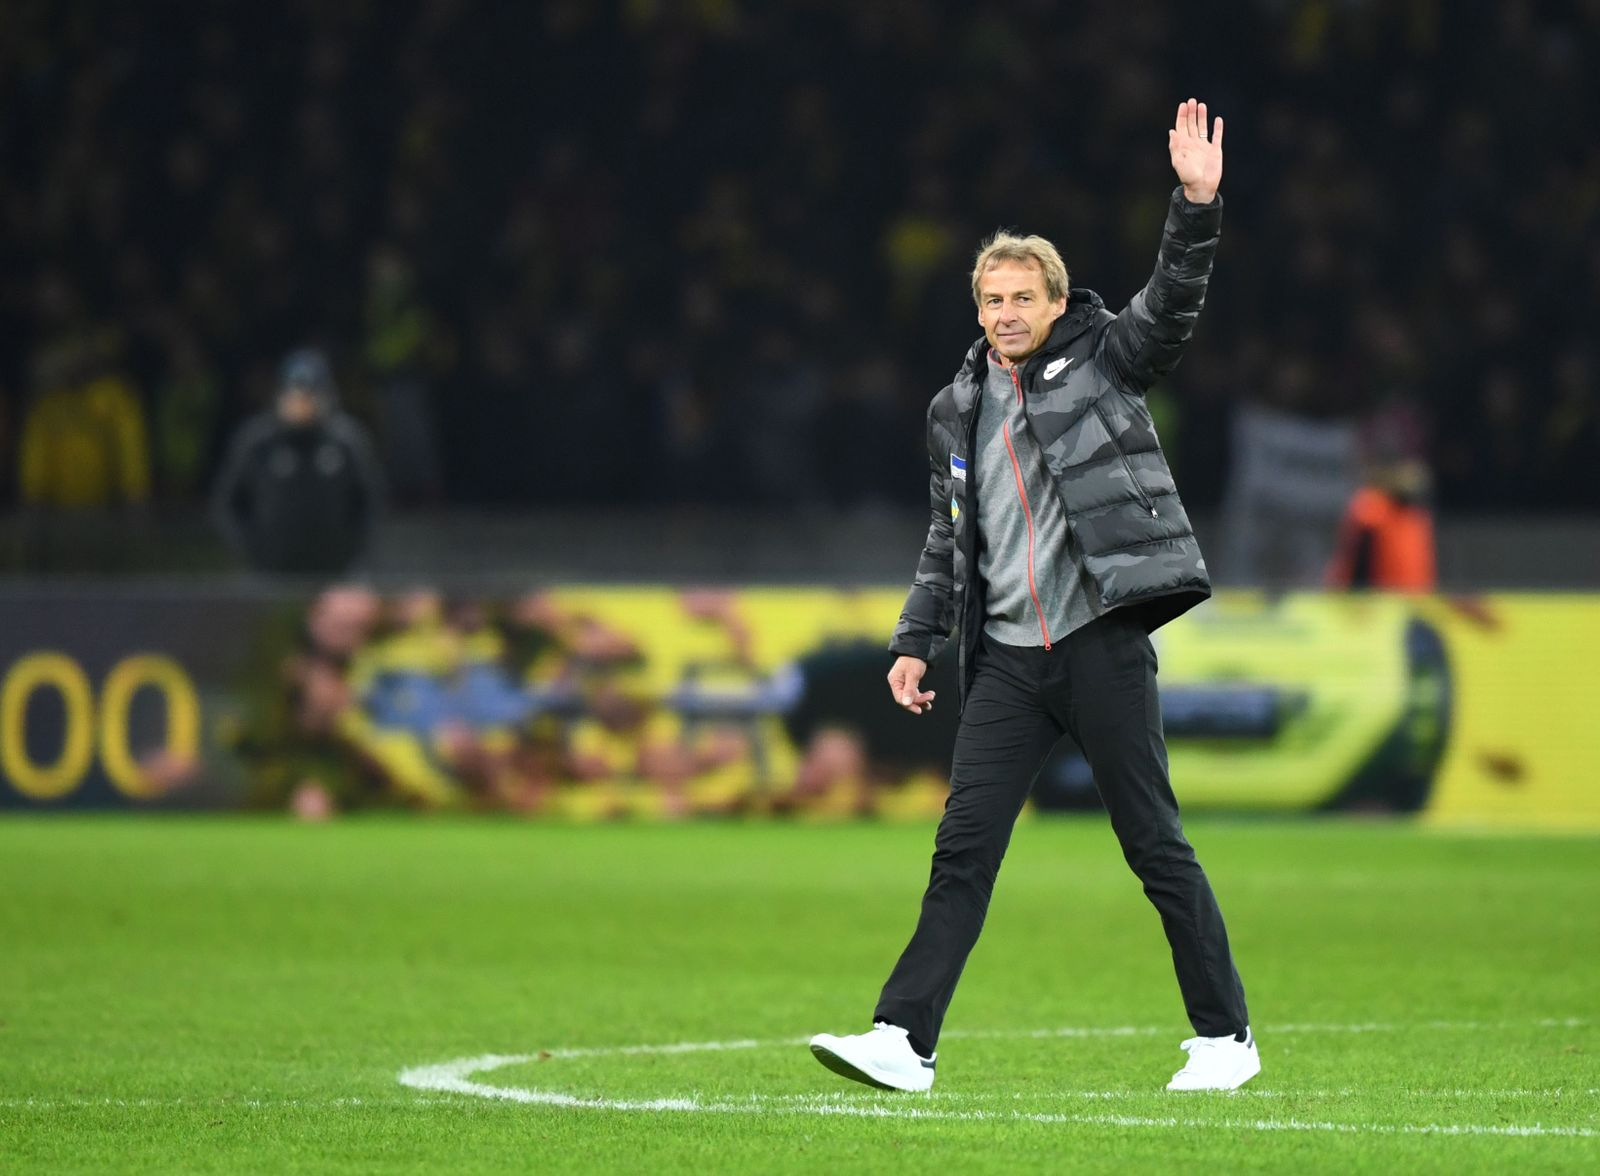 Fussball, Herren, 1. Bundesliga, Saison 2019/20, (13. Spieltag), Hertha BSC - Borussia Dortmund (1:2), v. l. Trainer Jür